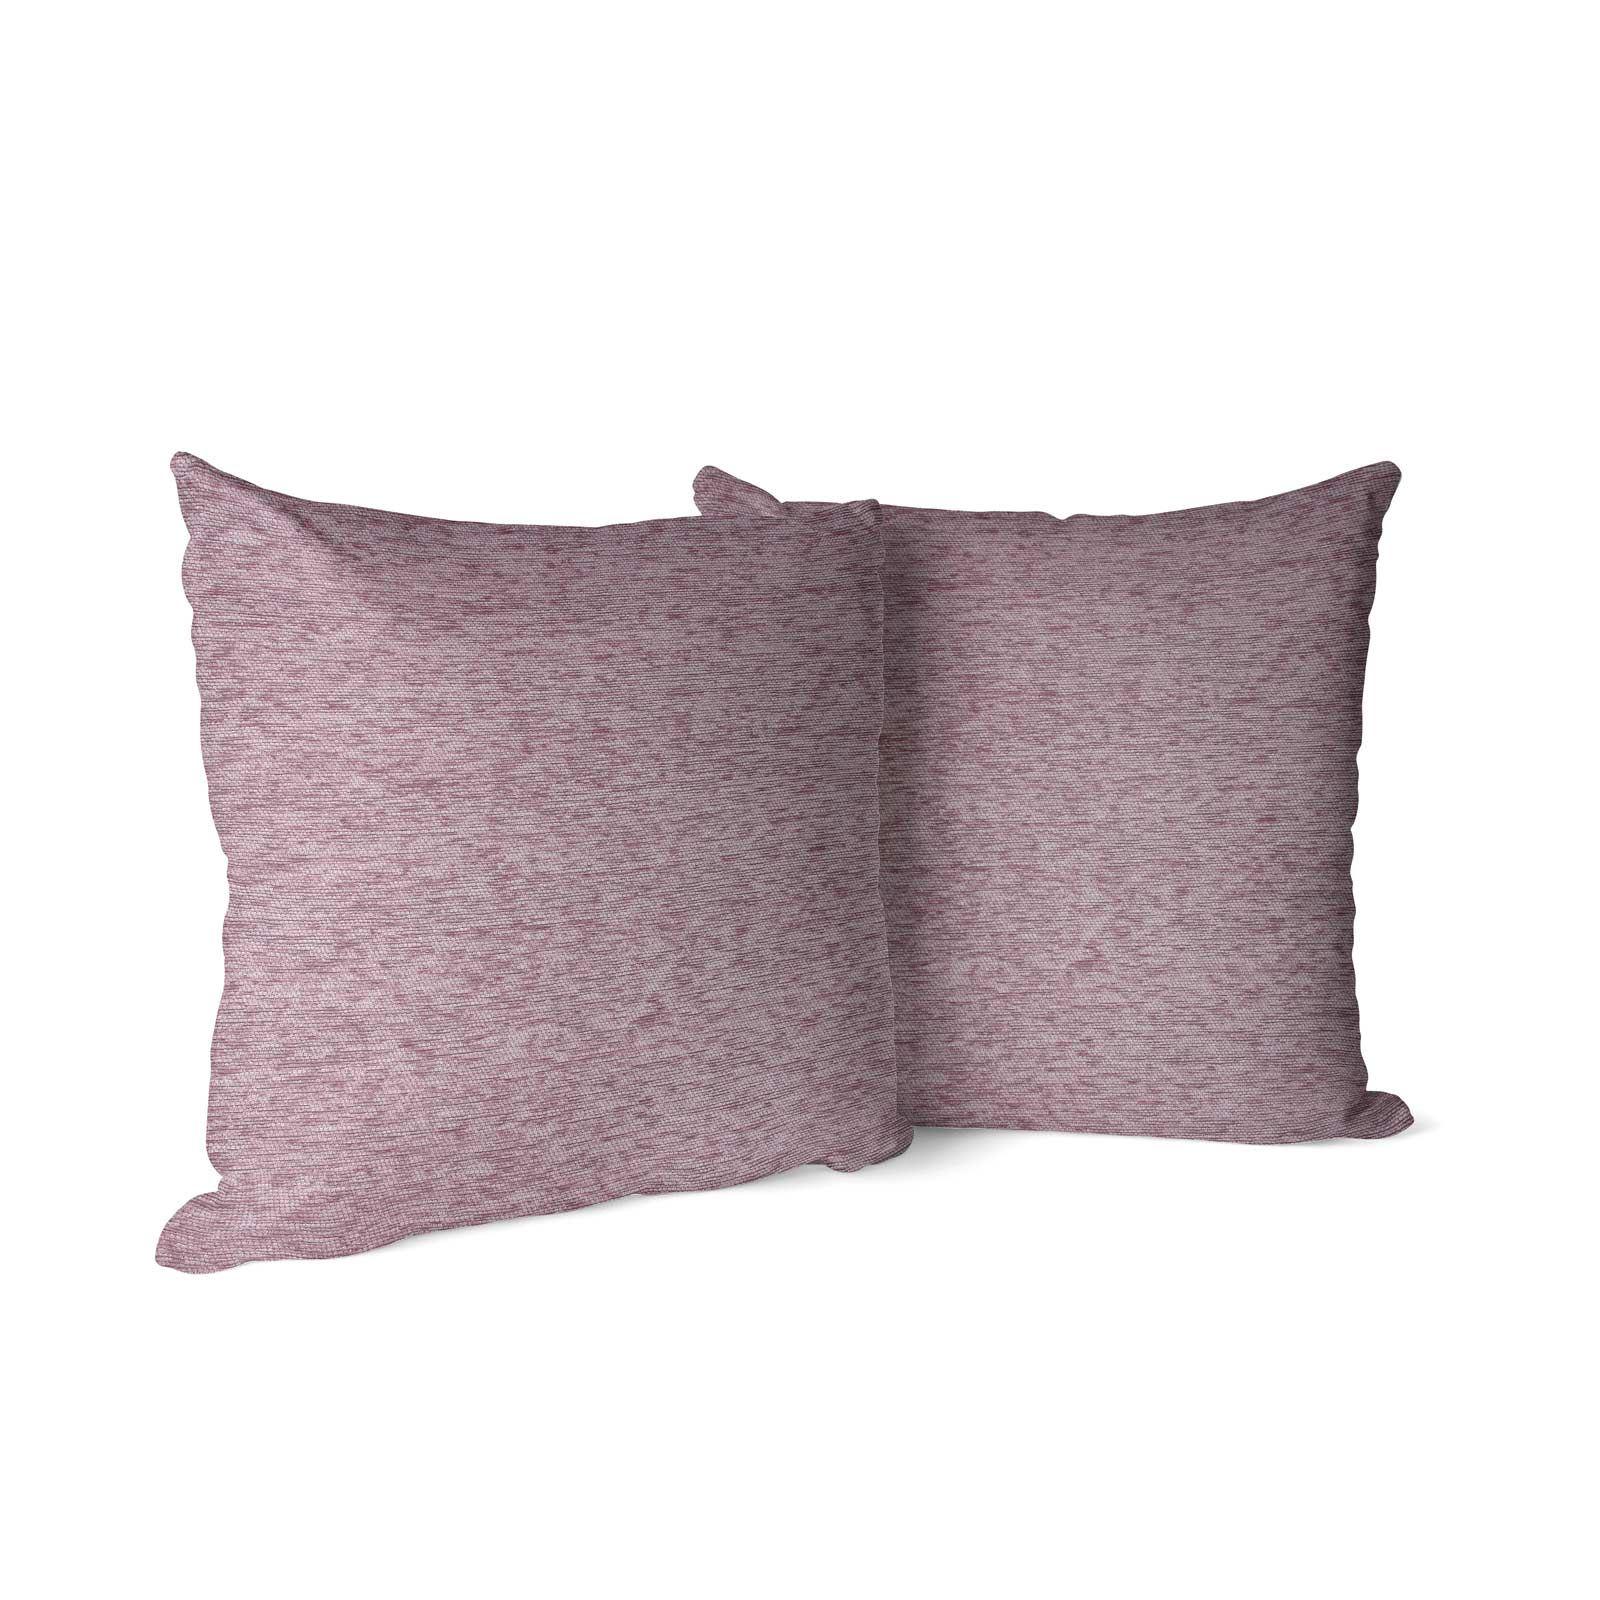 Set-of-2-Chenille-Cushion-Covers-Luxury-Plain-Cushions-Cover-Pairs-18-034-x-18-034 thumbnail 4